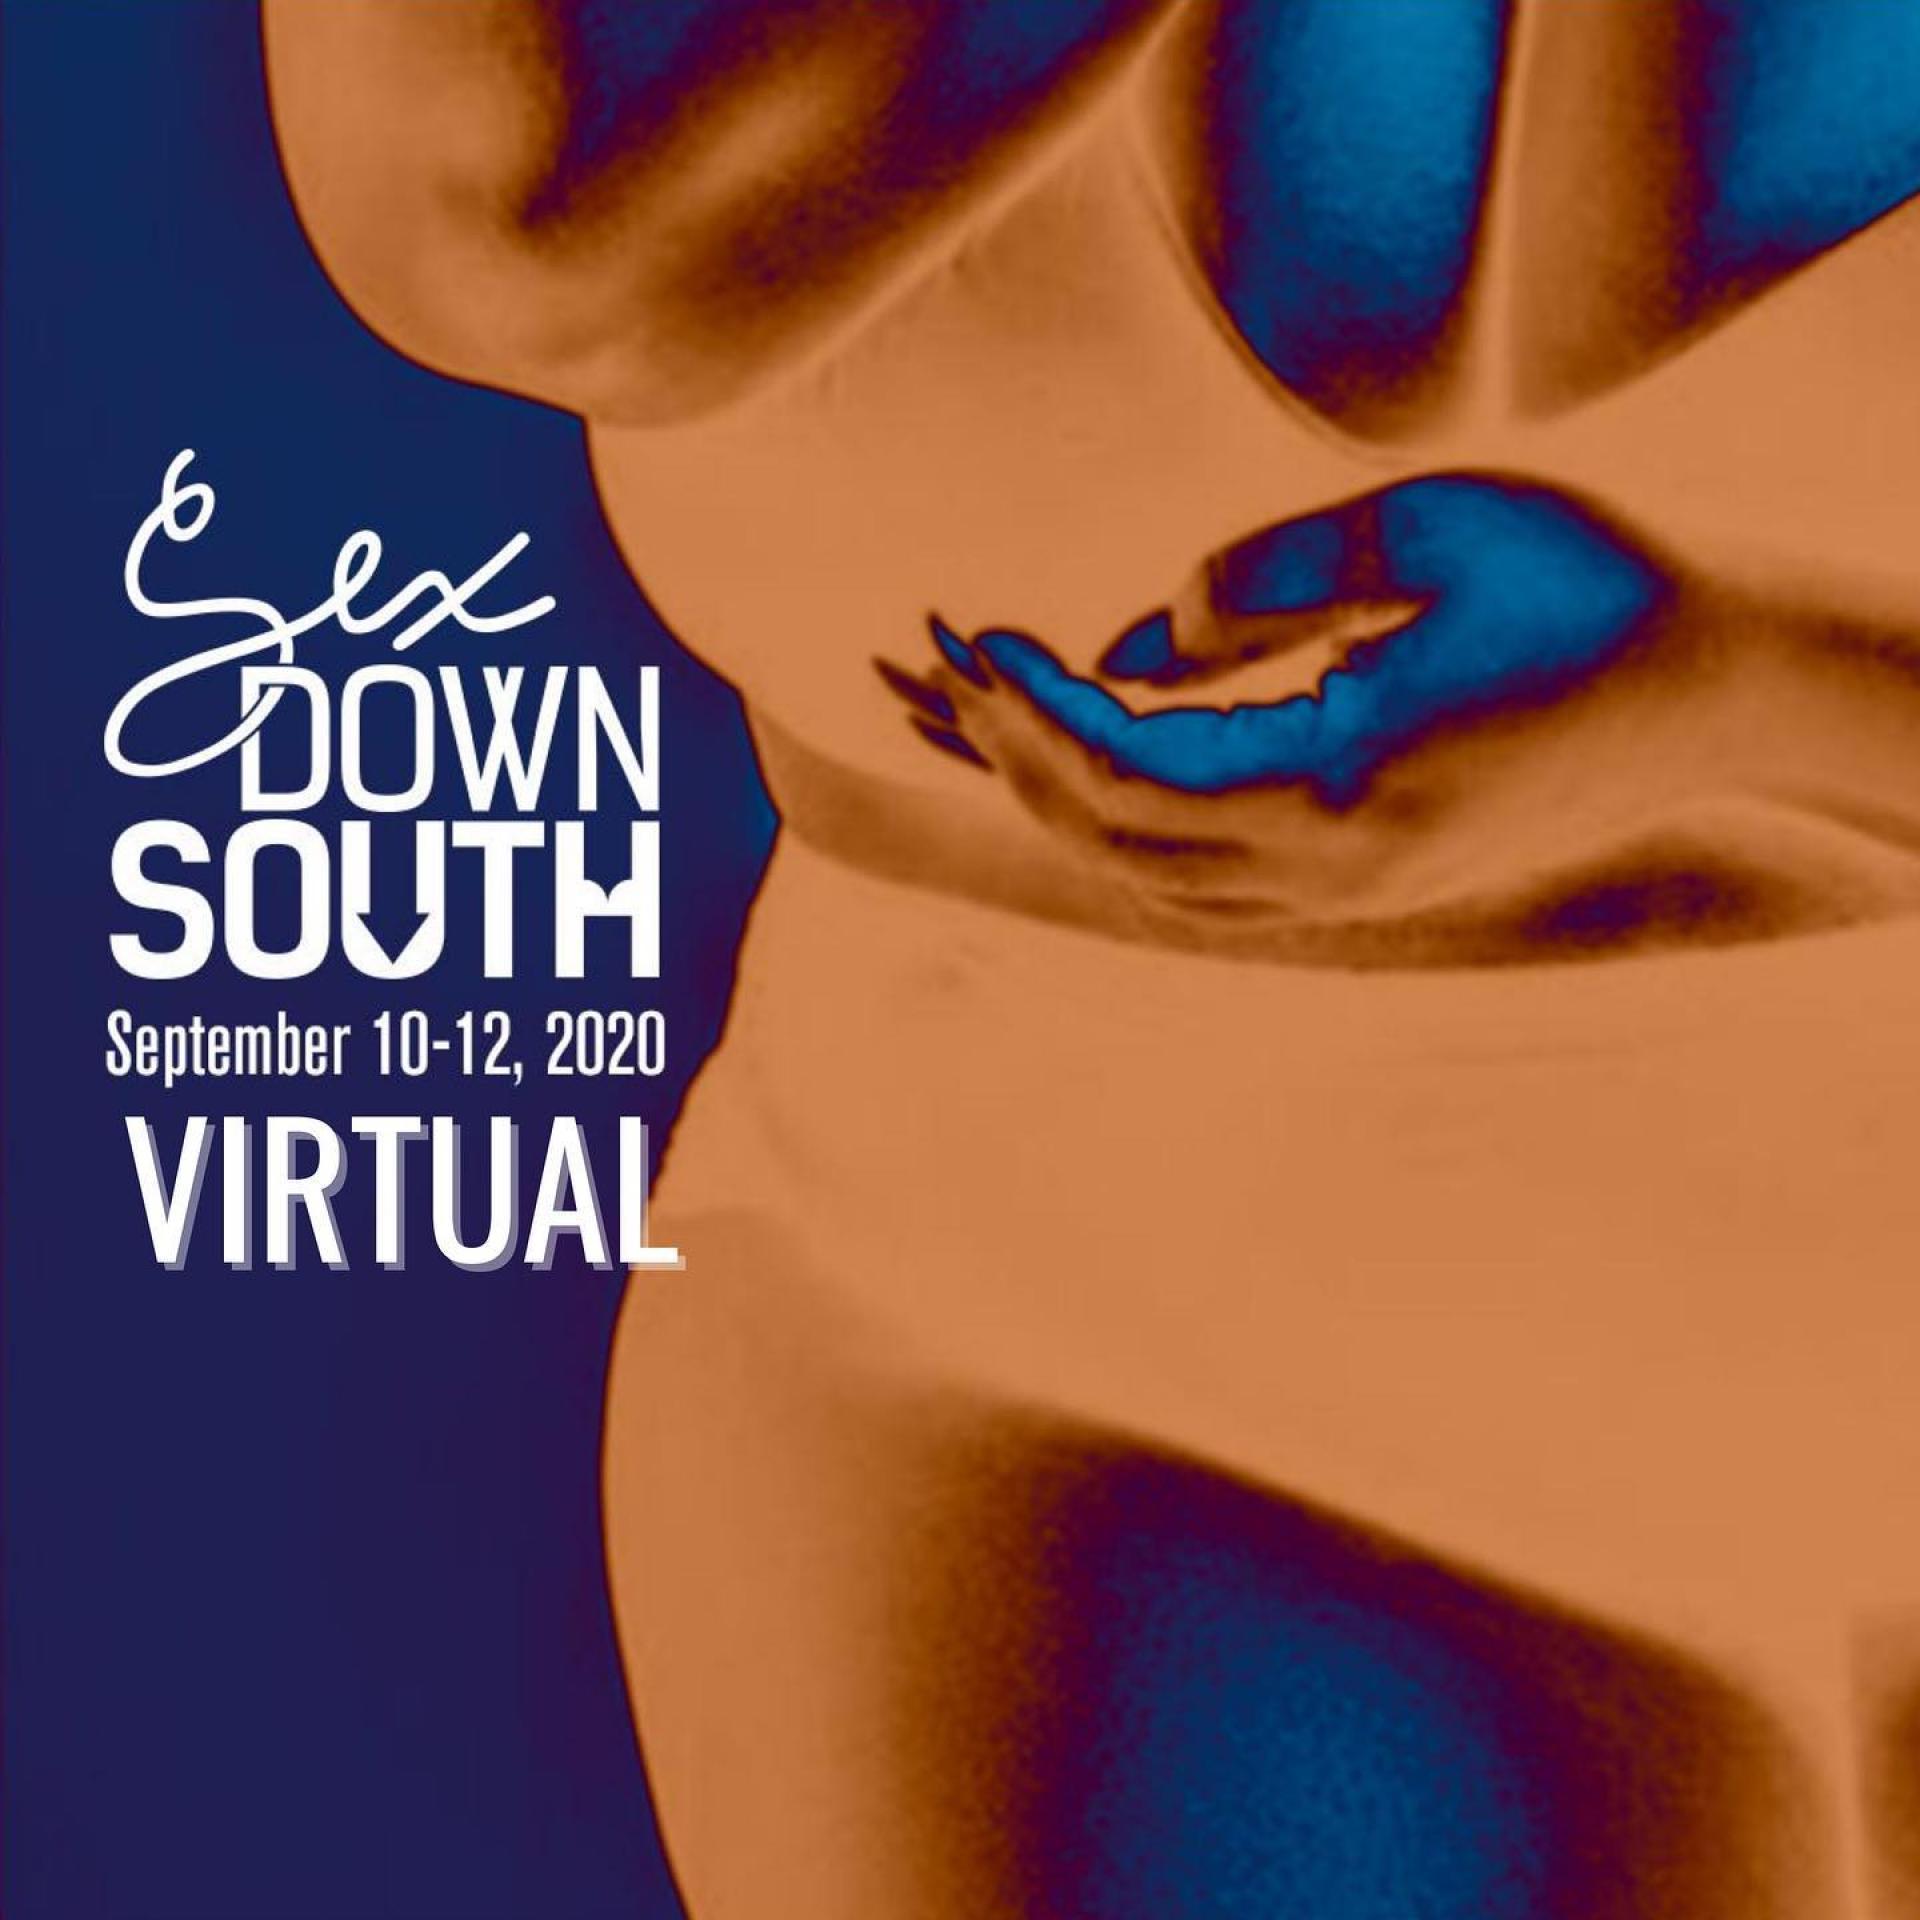 Sex Down South Virtual Con 2020